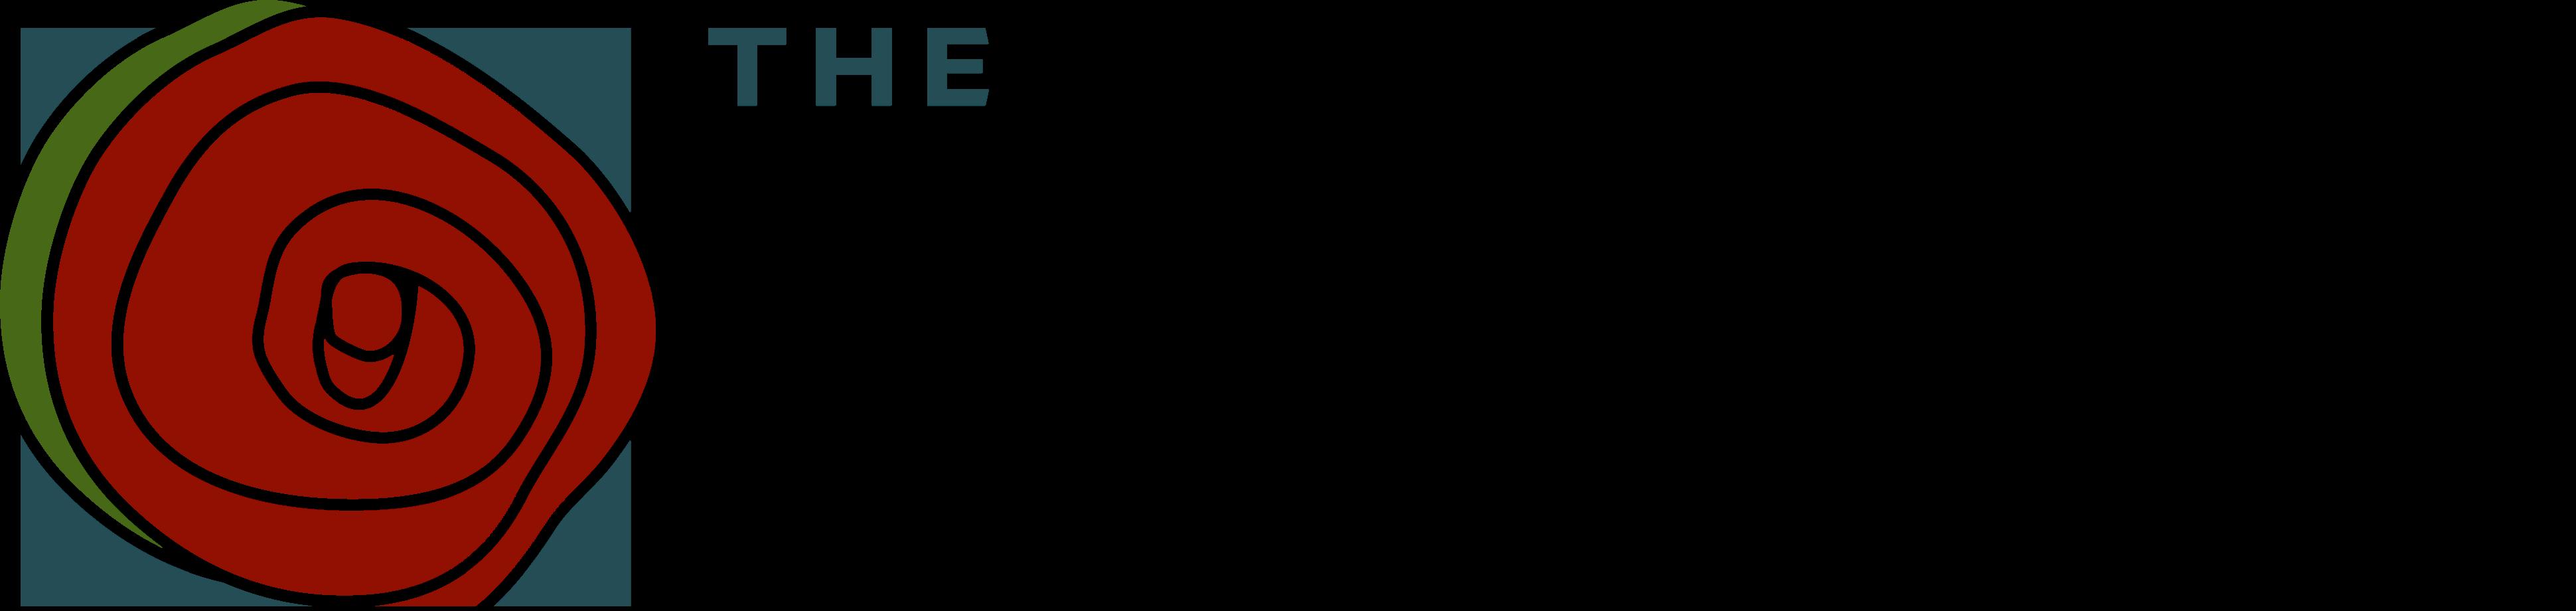 SkillmanFoundation-Logo.png